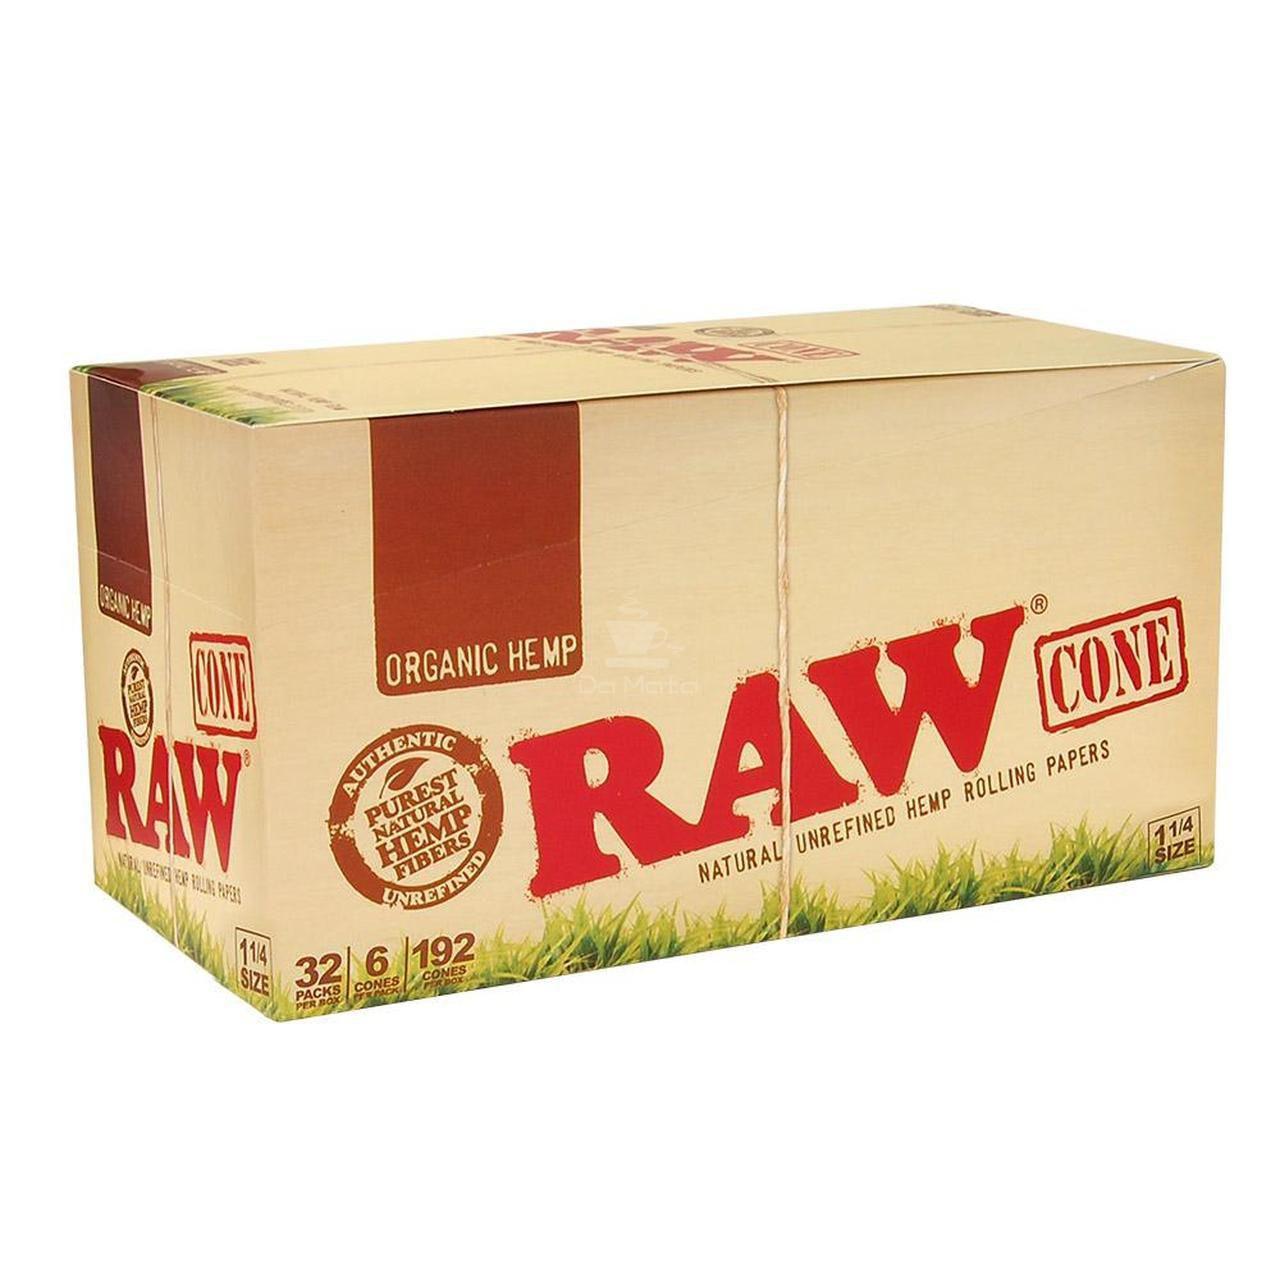 Caixa de Cone Raw Organic Hemp 1 1/4 - 32 unidades